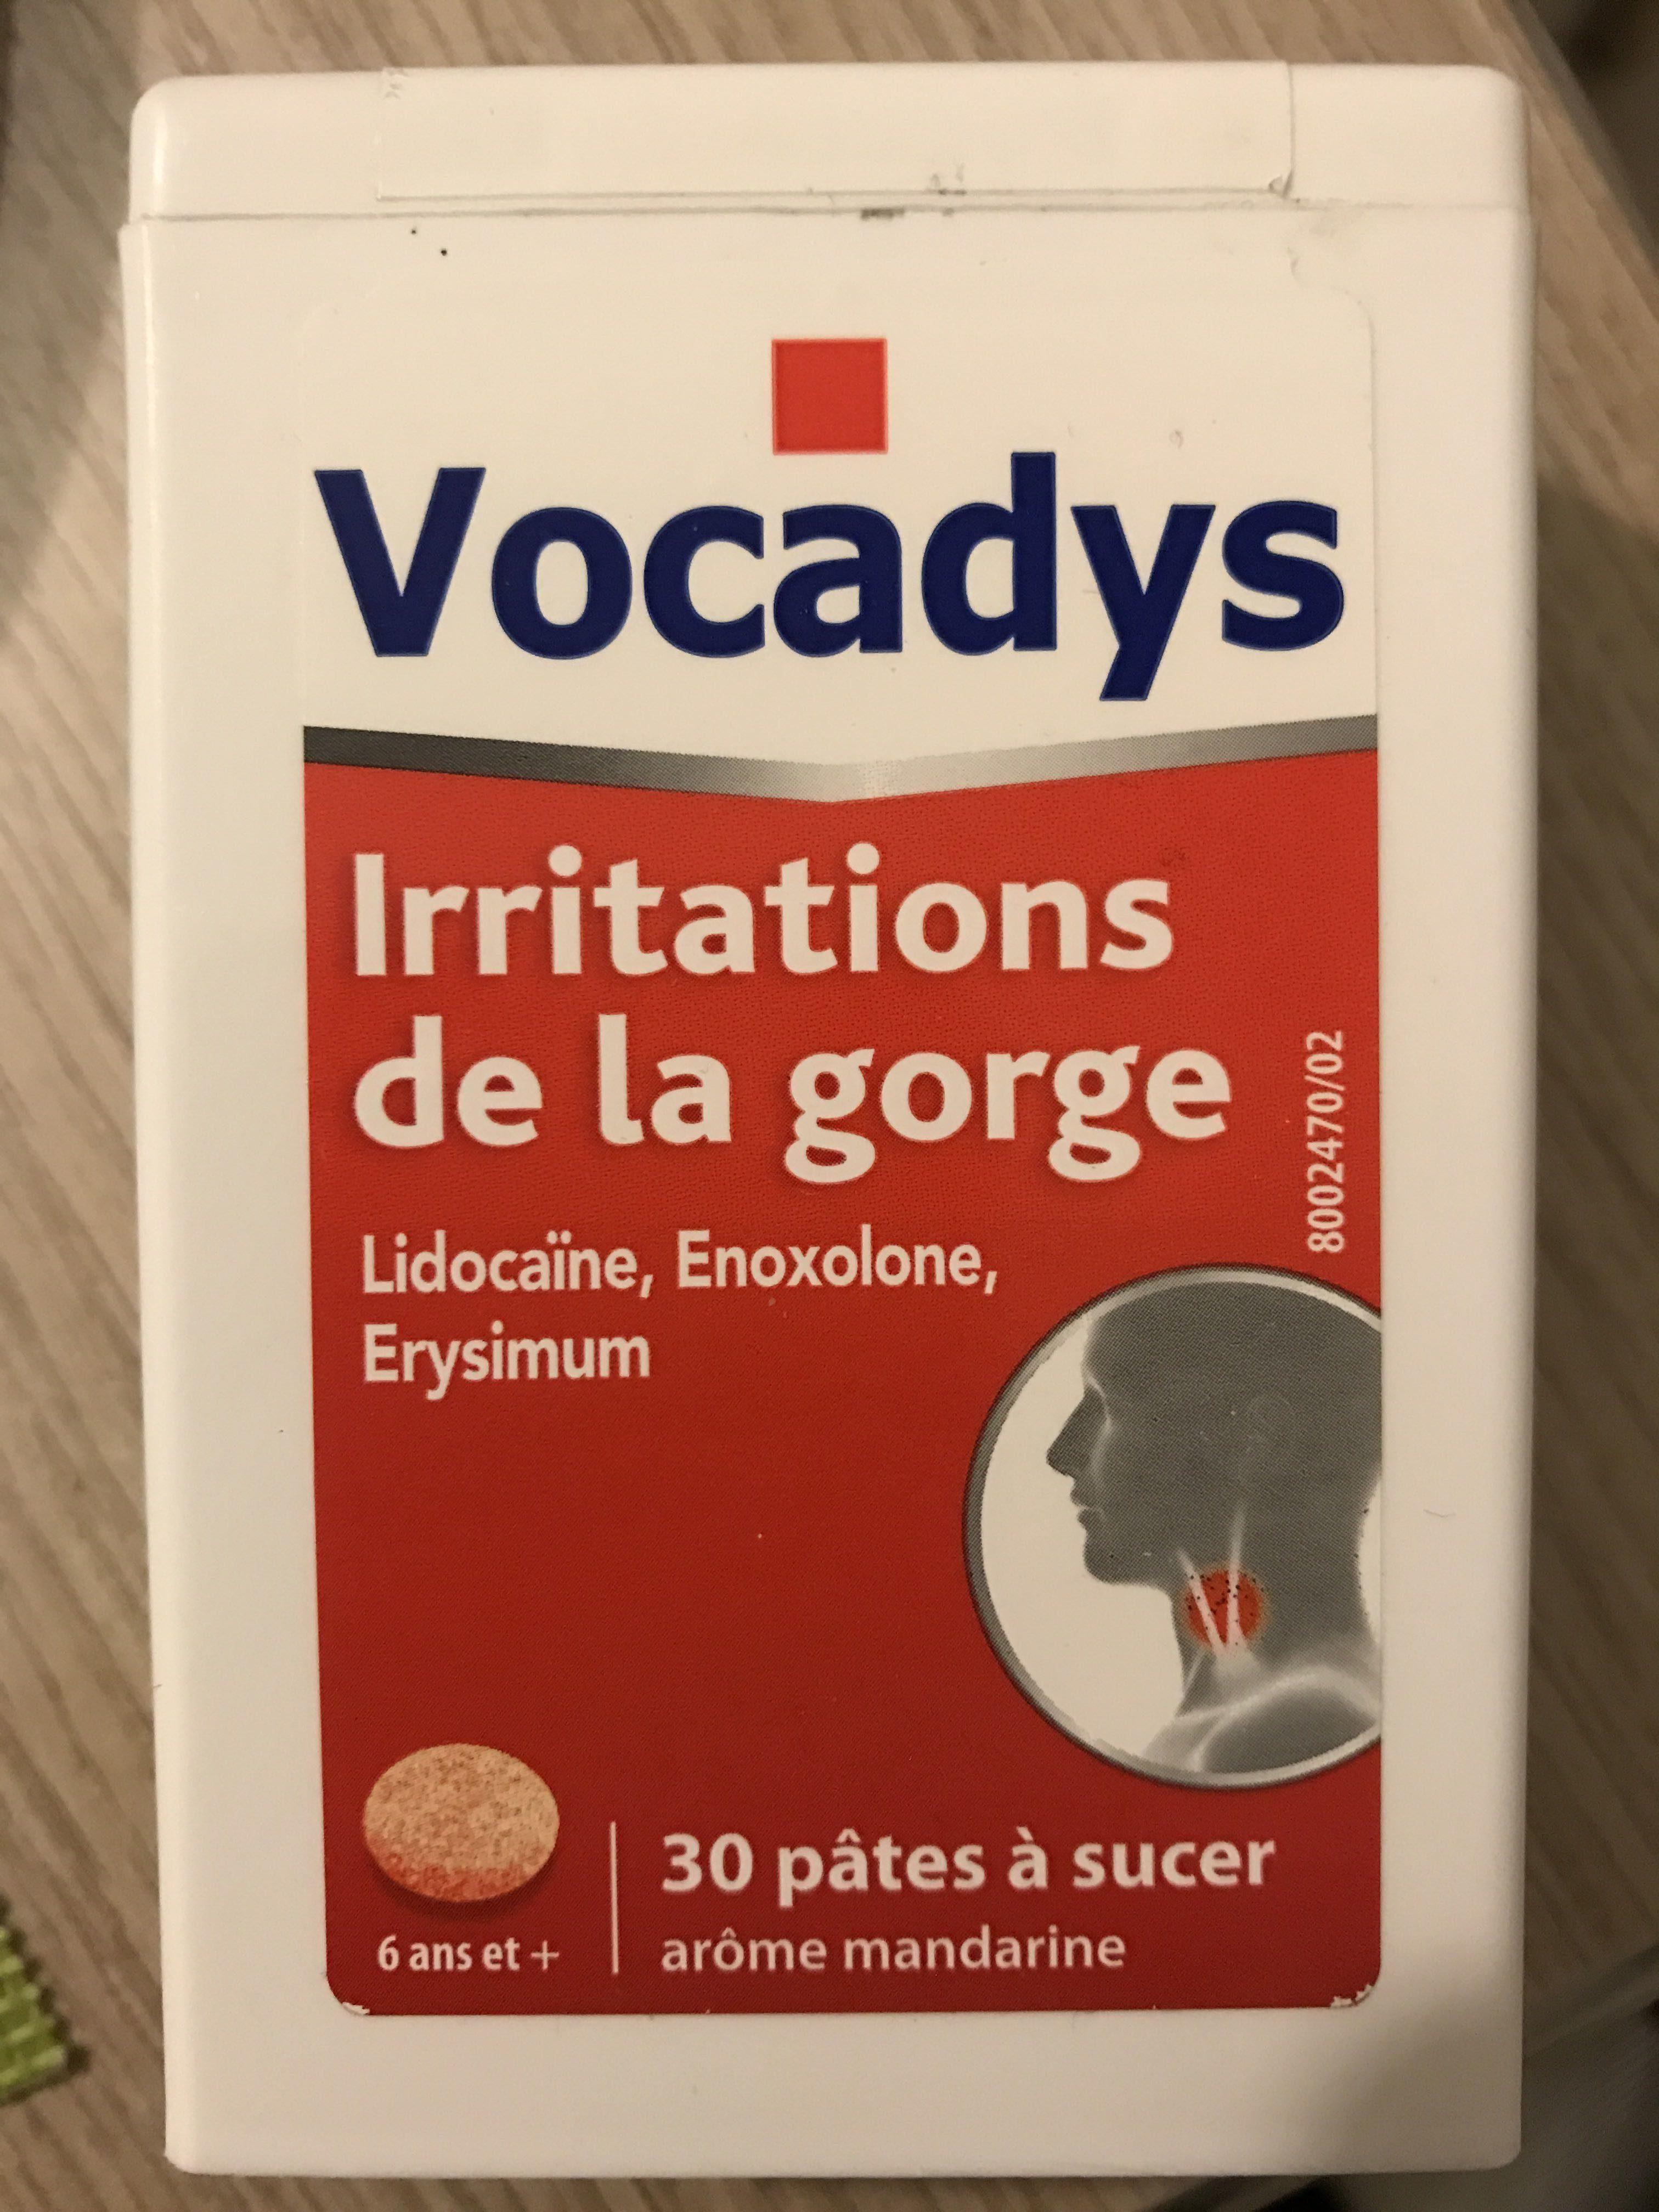 Vocadys - Product - fr